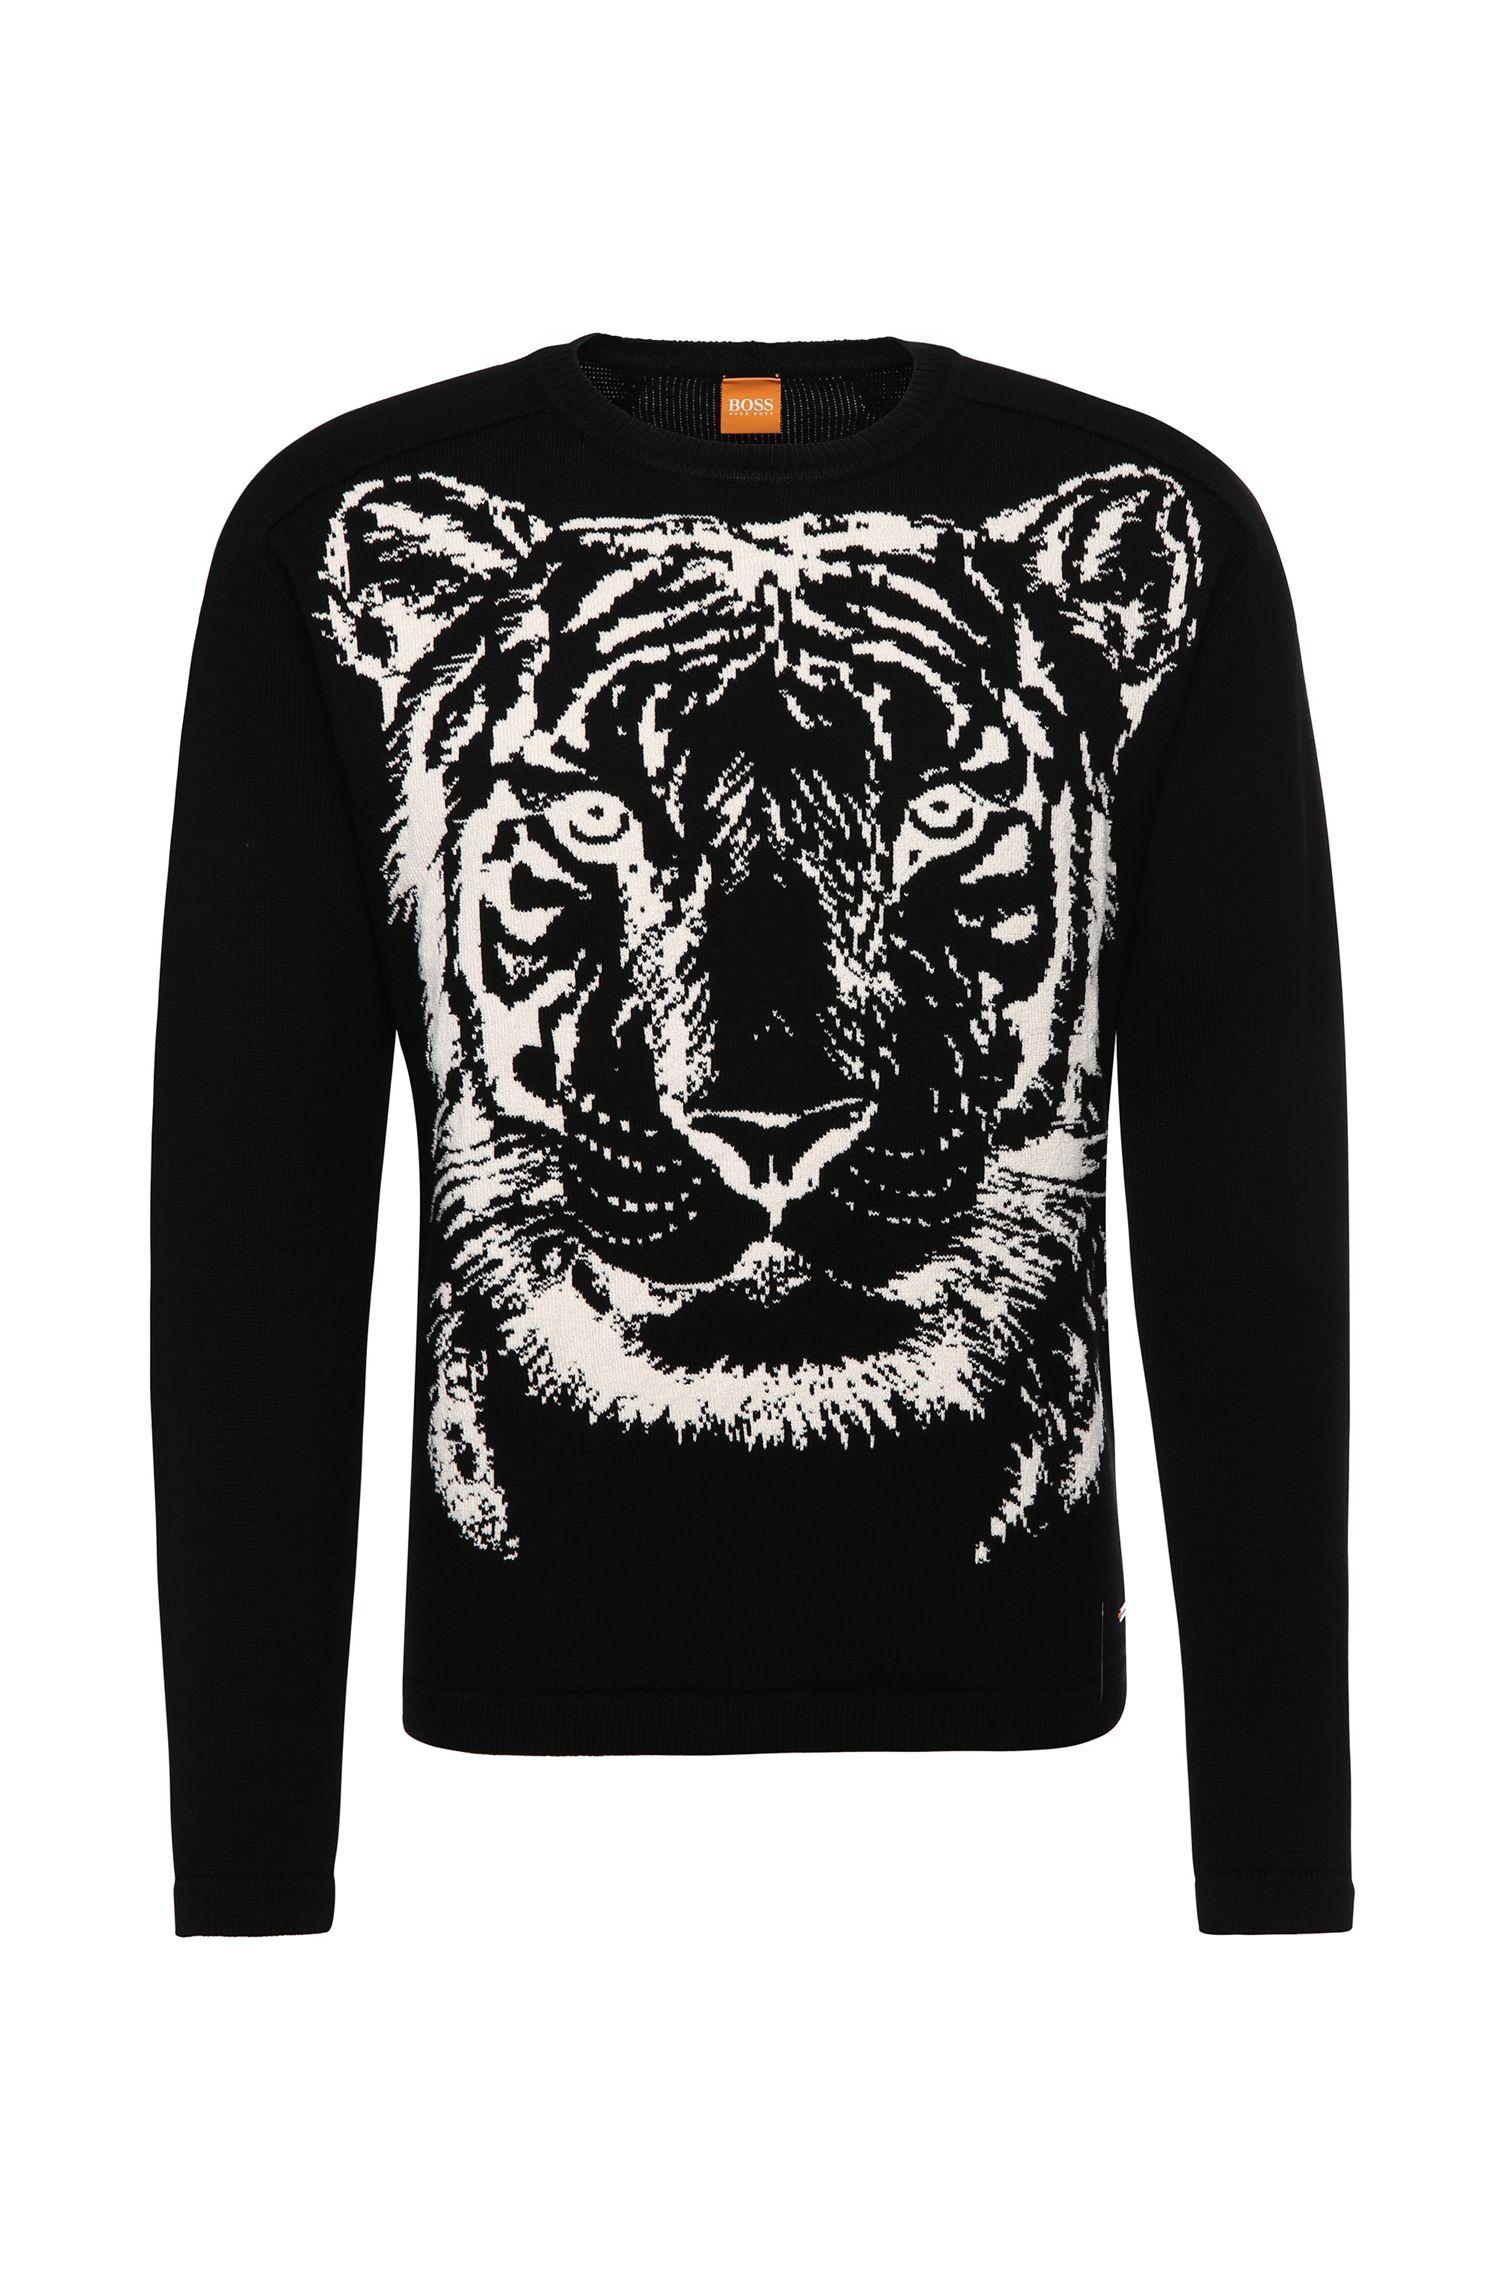 'Kiger' | Cotton Intarsia Knit Sweater